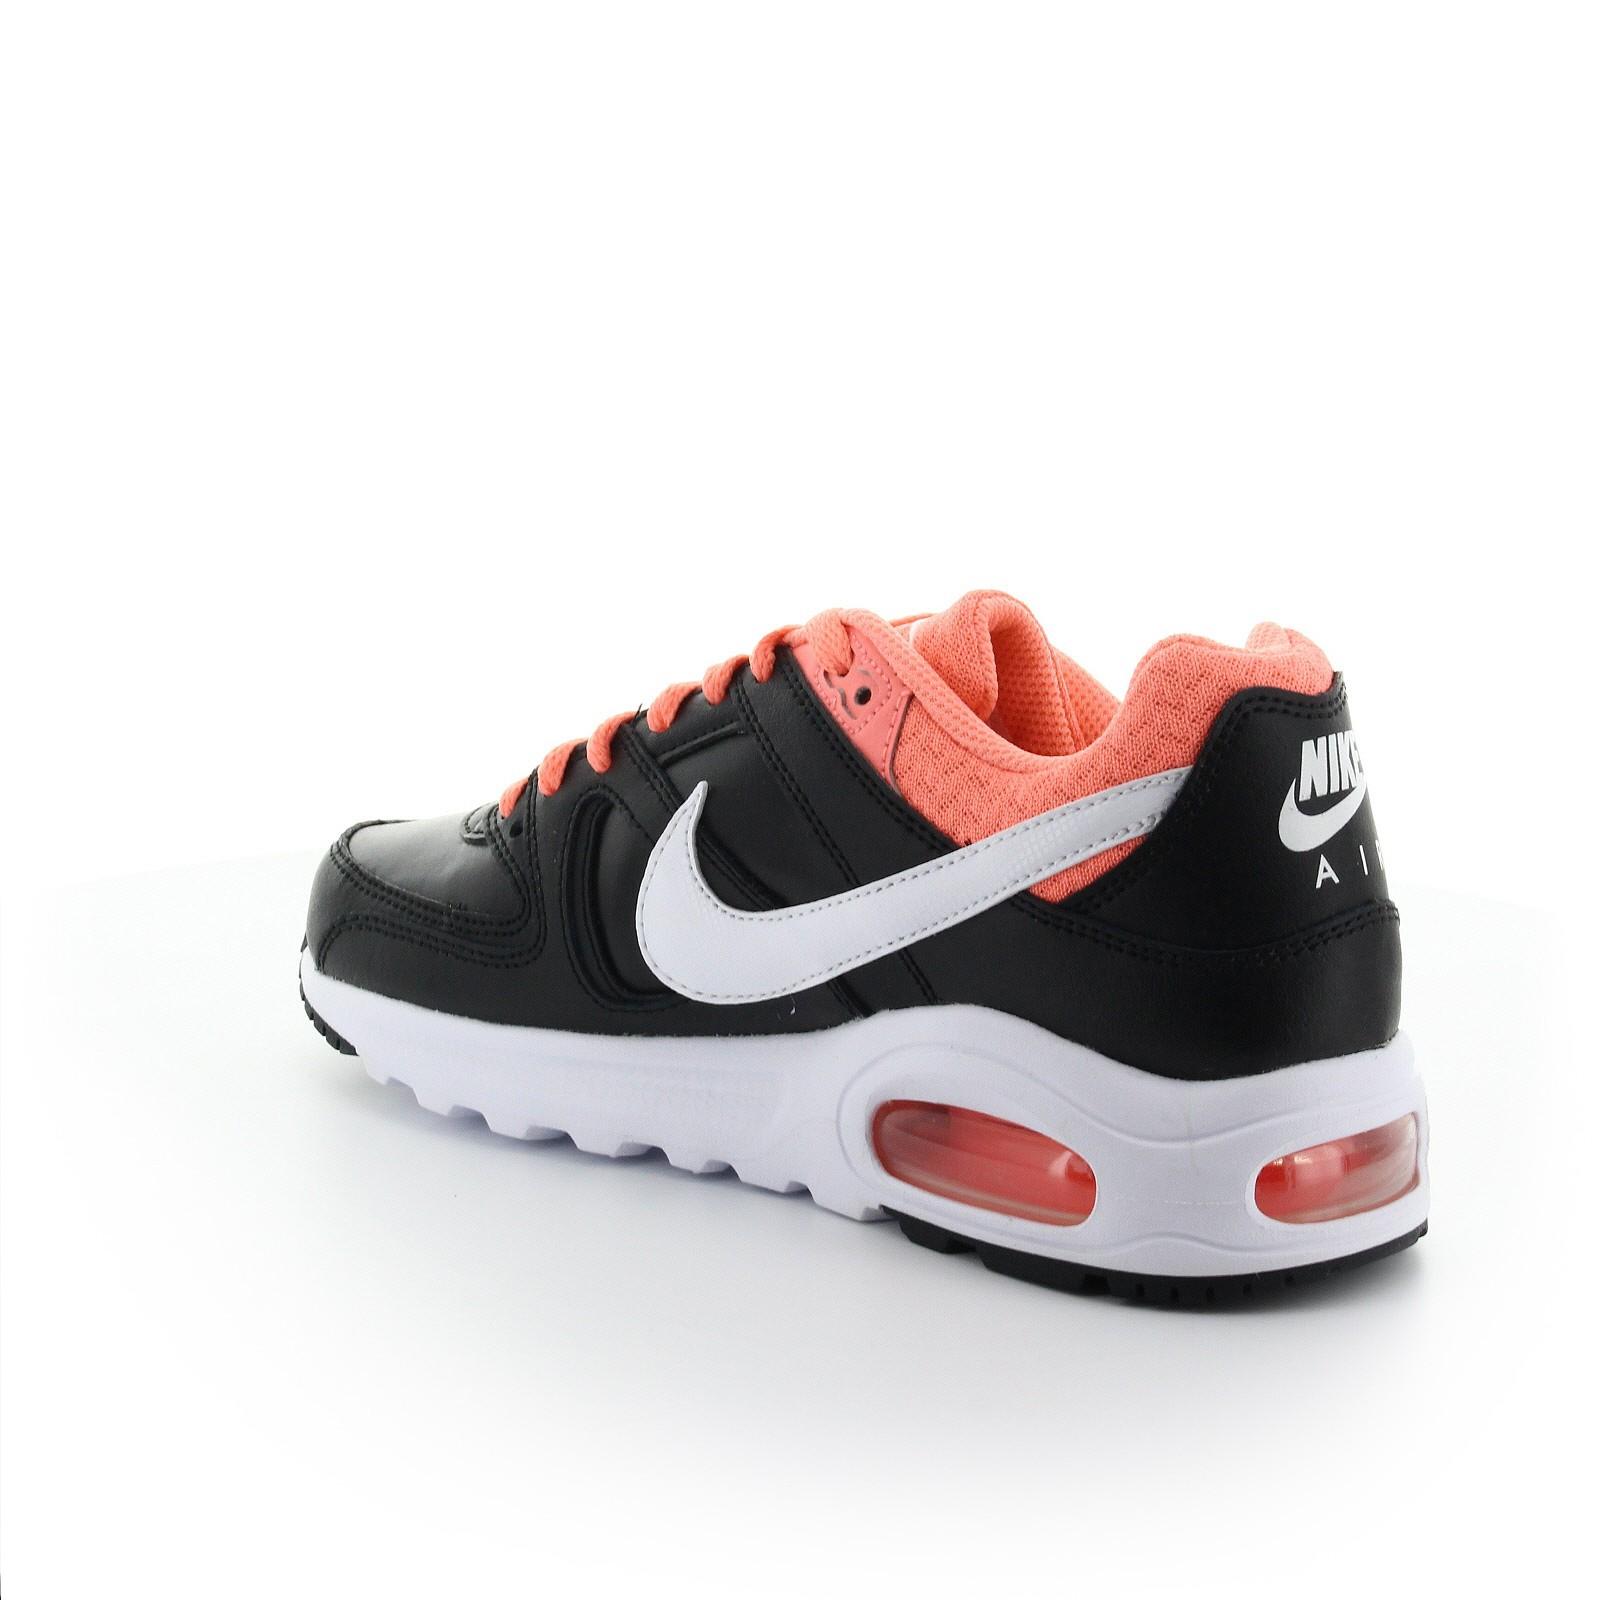 68d8597865 sneakers retro running Nike air max command flex ltr gs - Pantofi ...